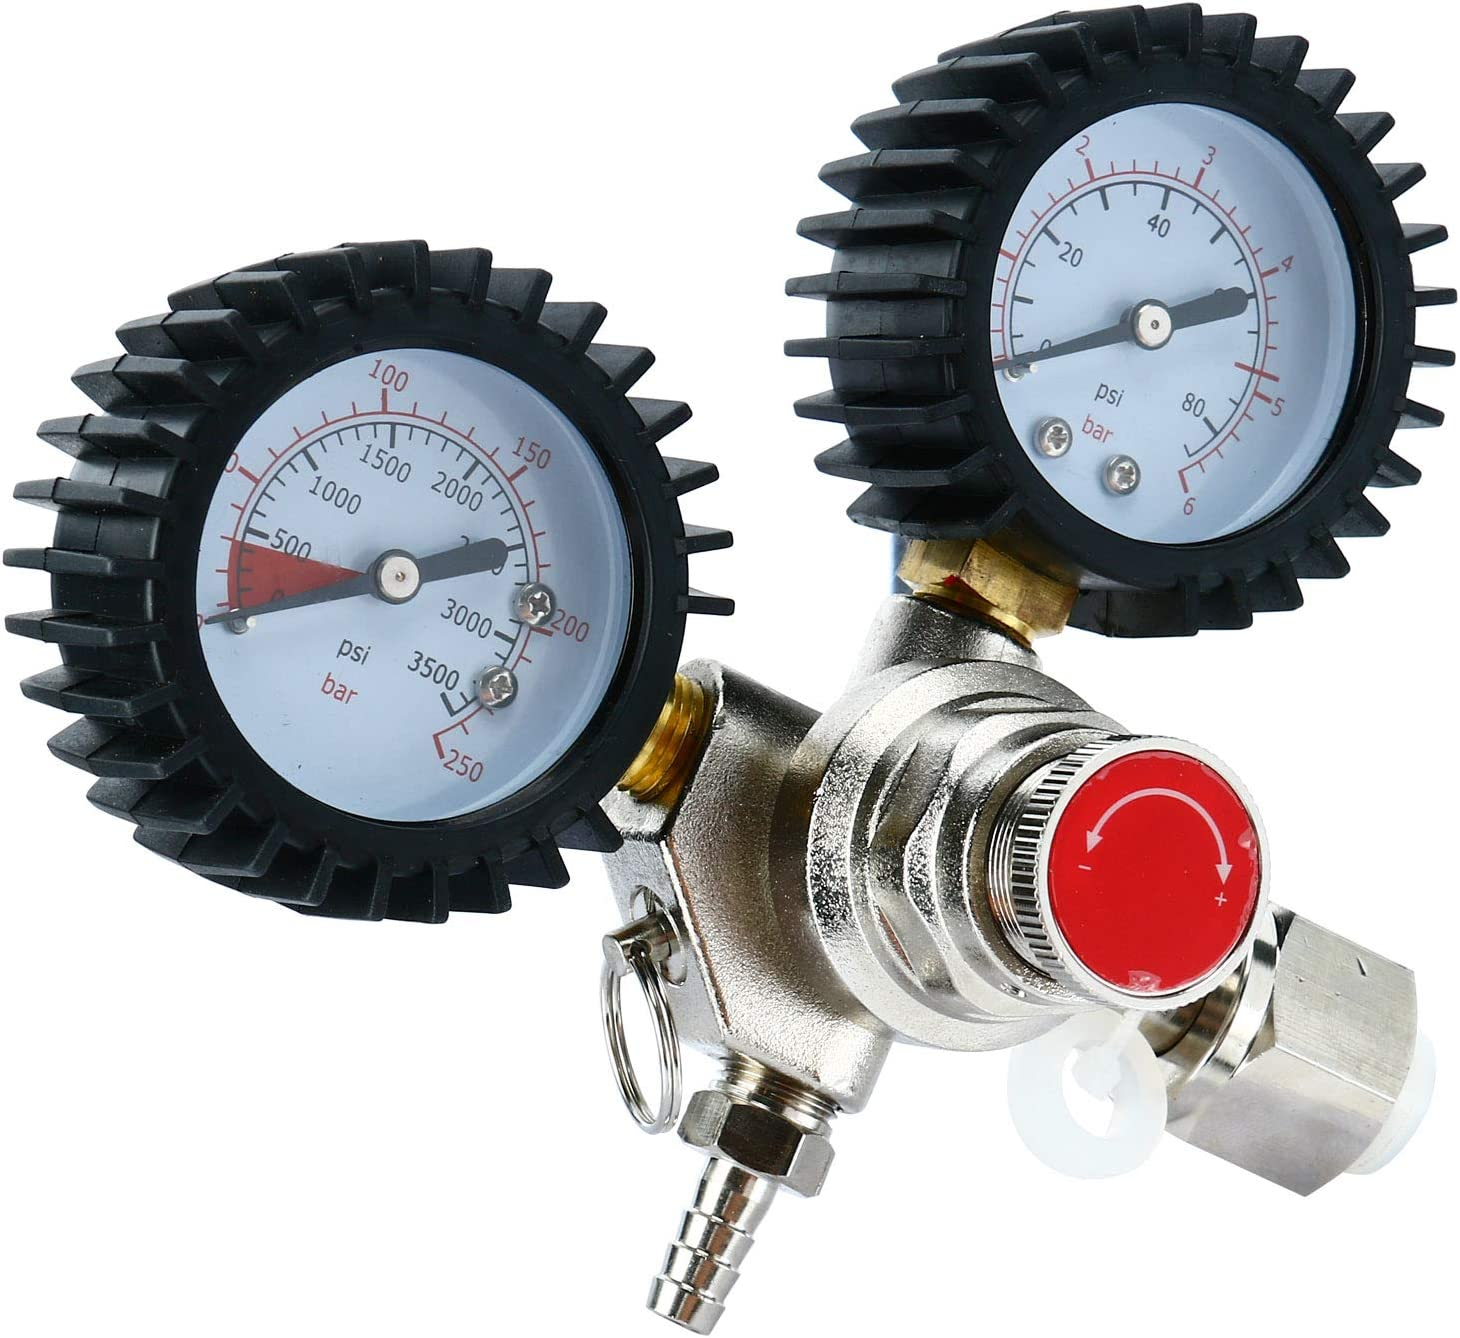 YaeBrew Dual Gauge CO2 Regulator for Draft Beer Homebrew Kegerator CGA320